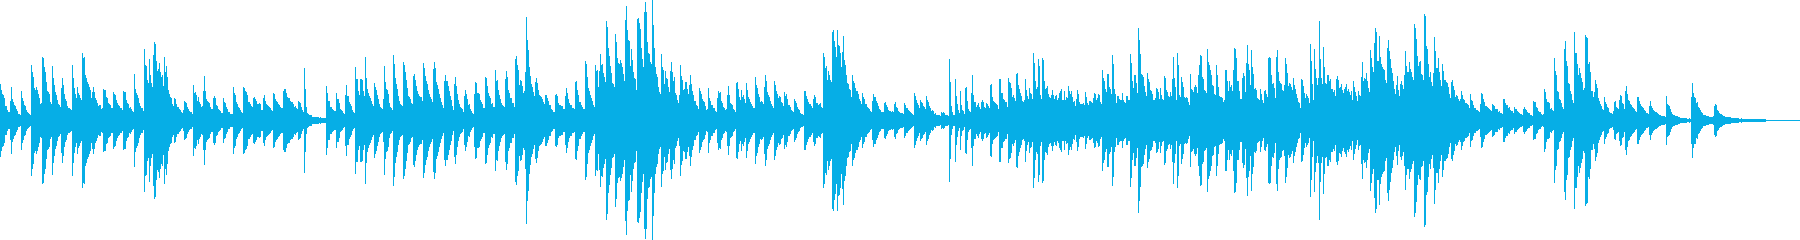 Compassion (piano ballad, impression, gentle)'s reproduced waveform